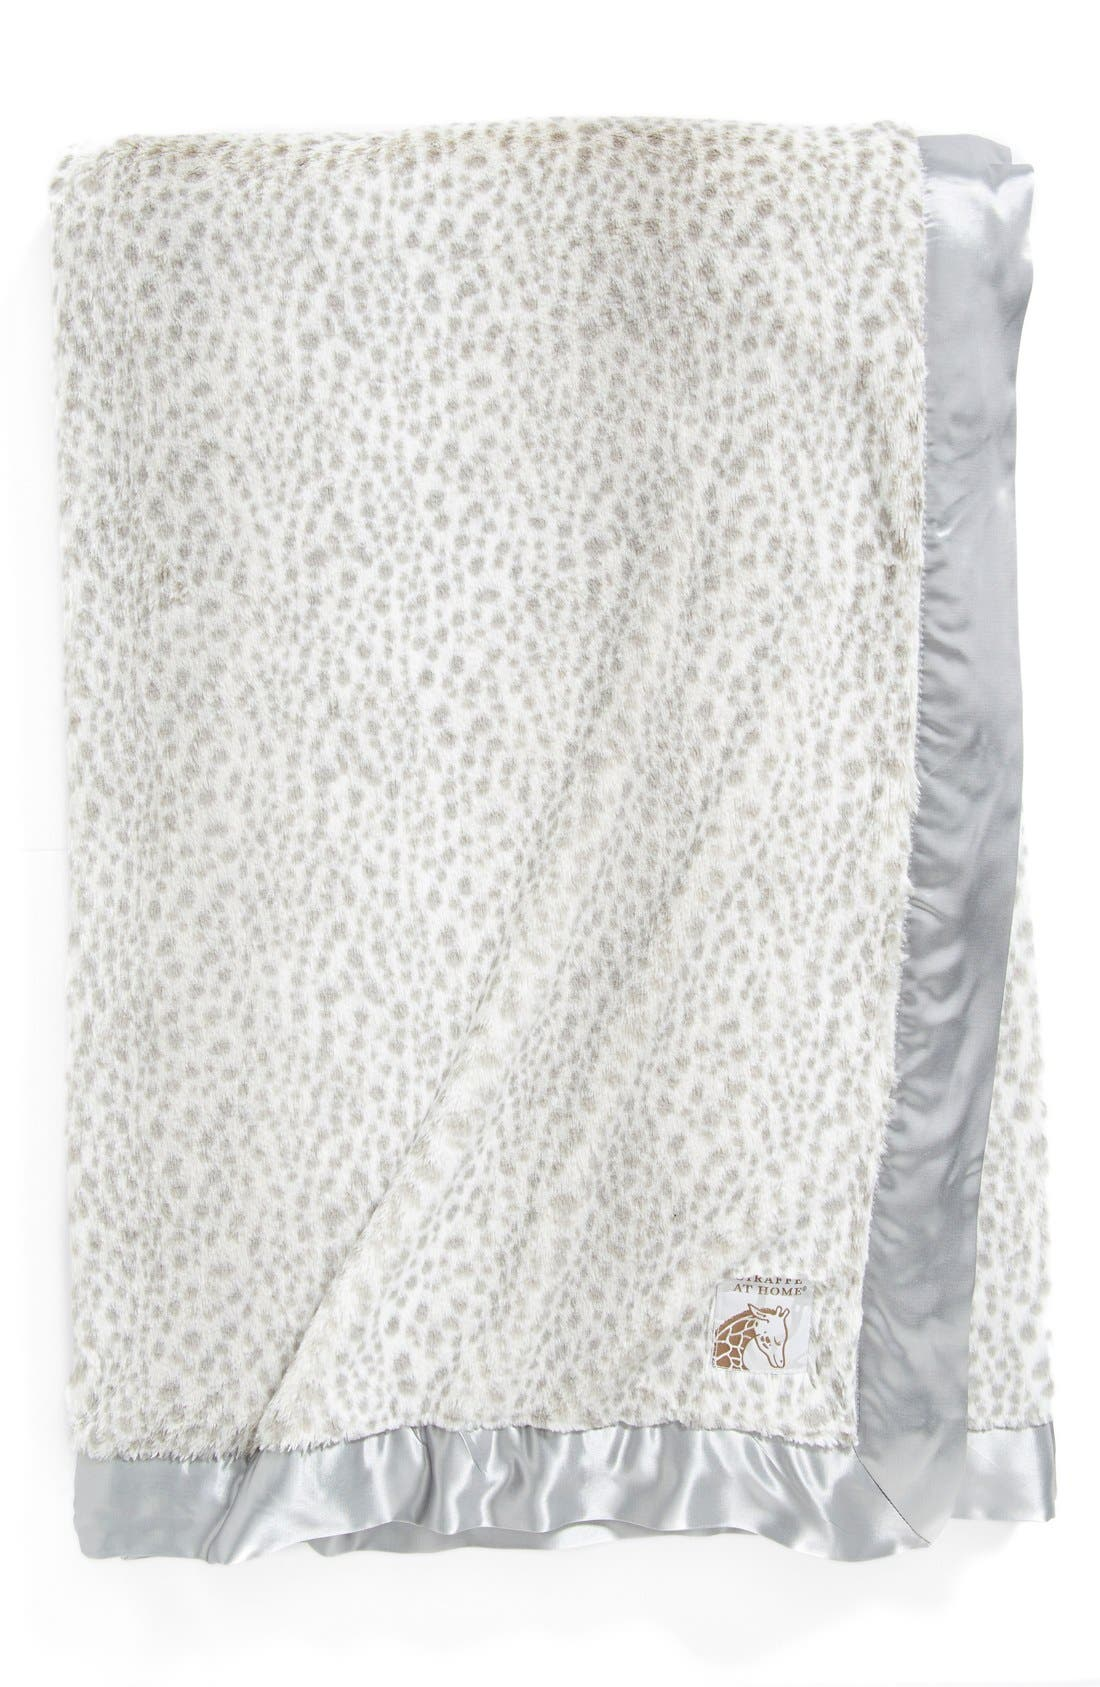 'Luxe Snow Leopard - Double' Faux Fur Throw,                             Main thumbnail 1, color,                             040